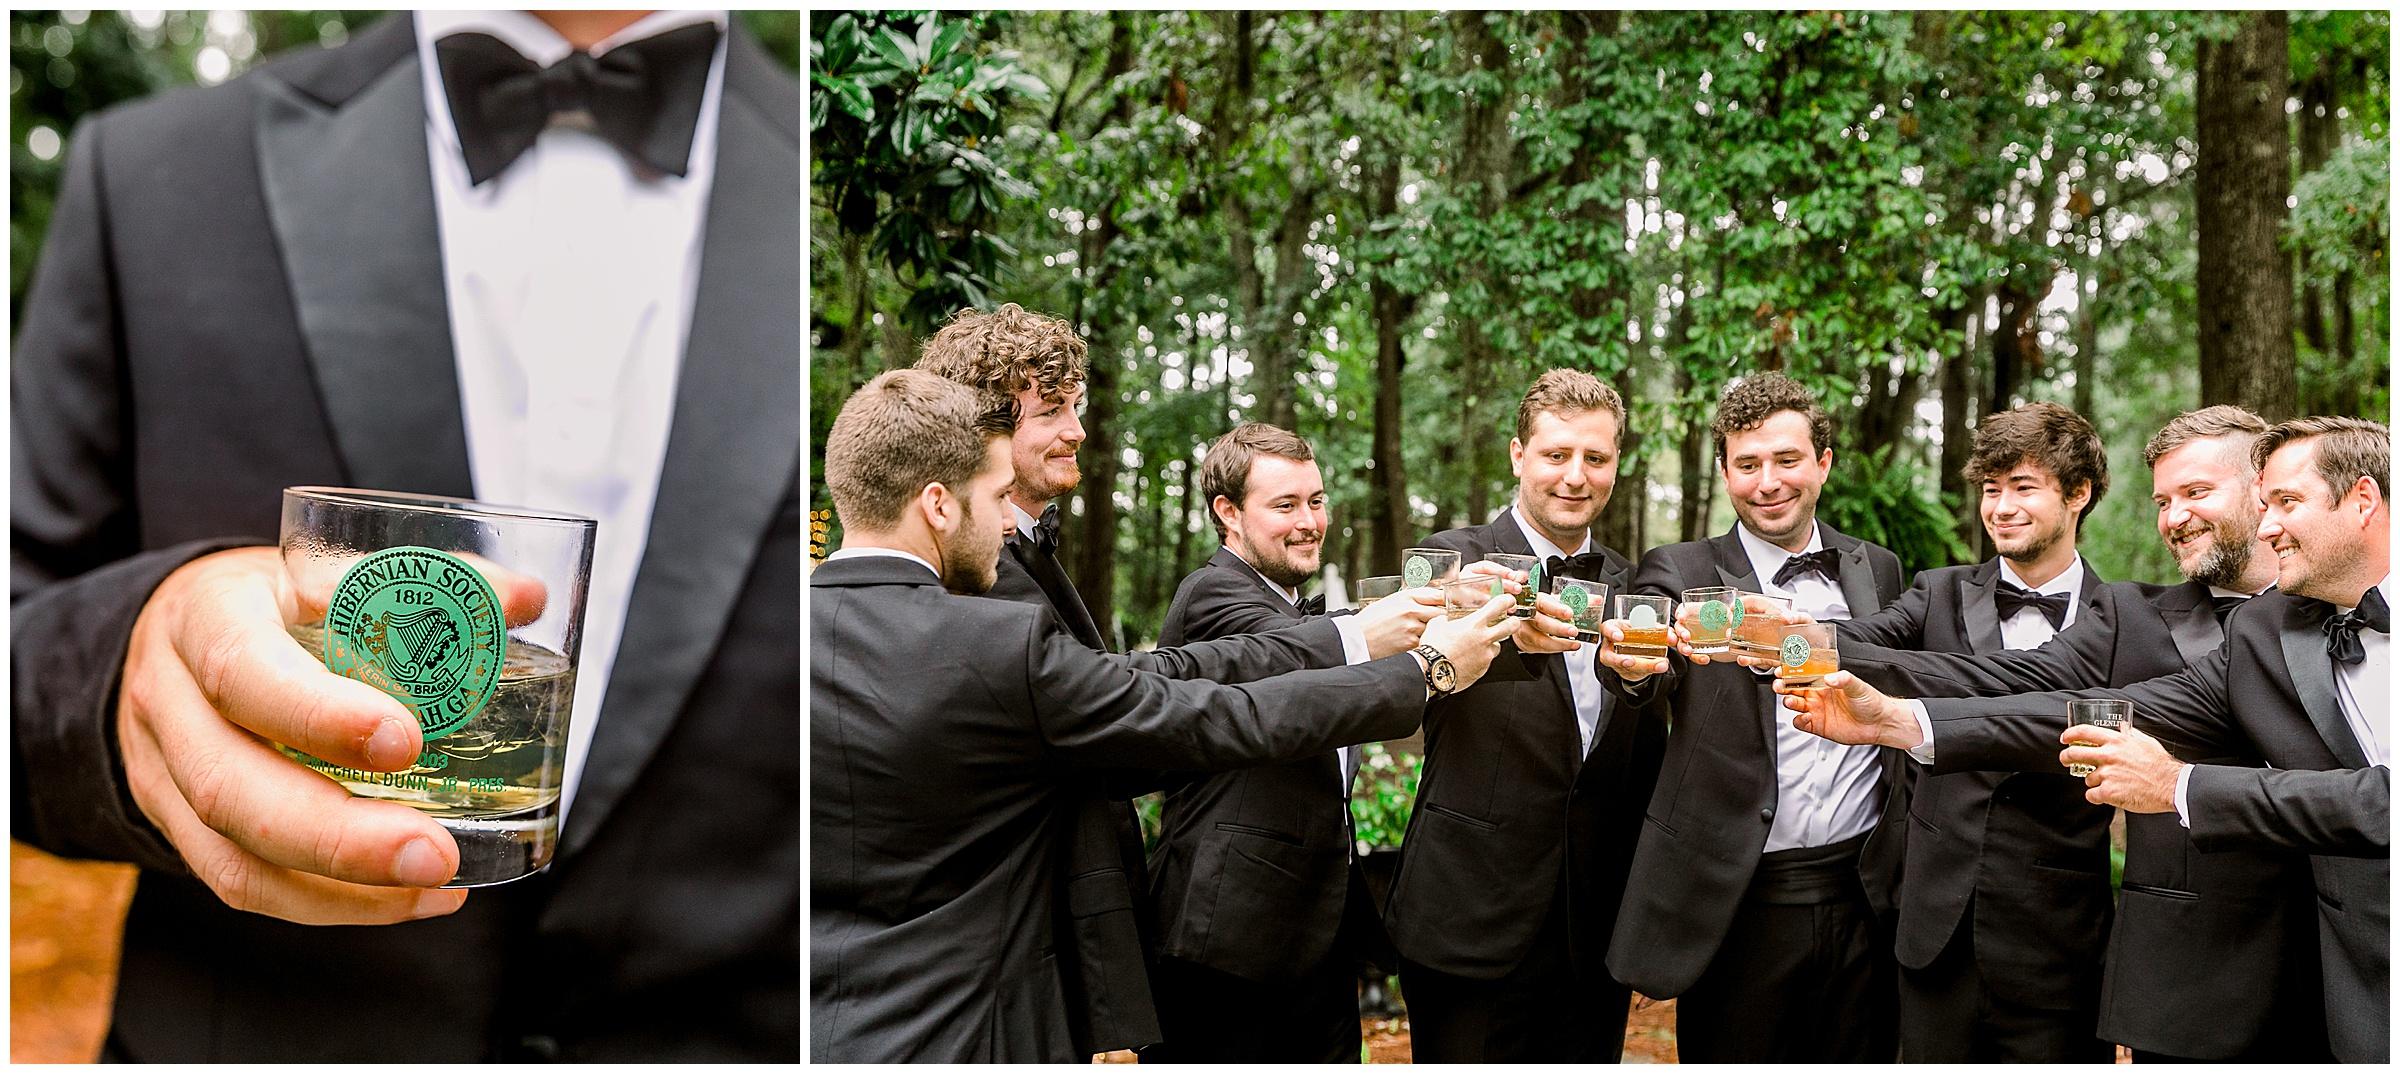 KIP EDGEMON WEDDING MACKEY HOUSE 2.jpg